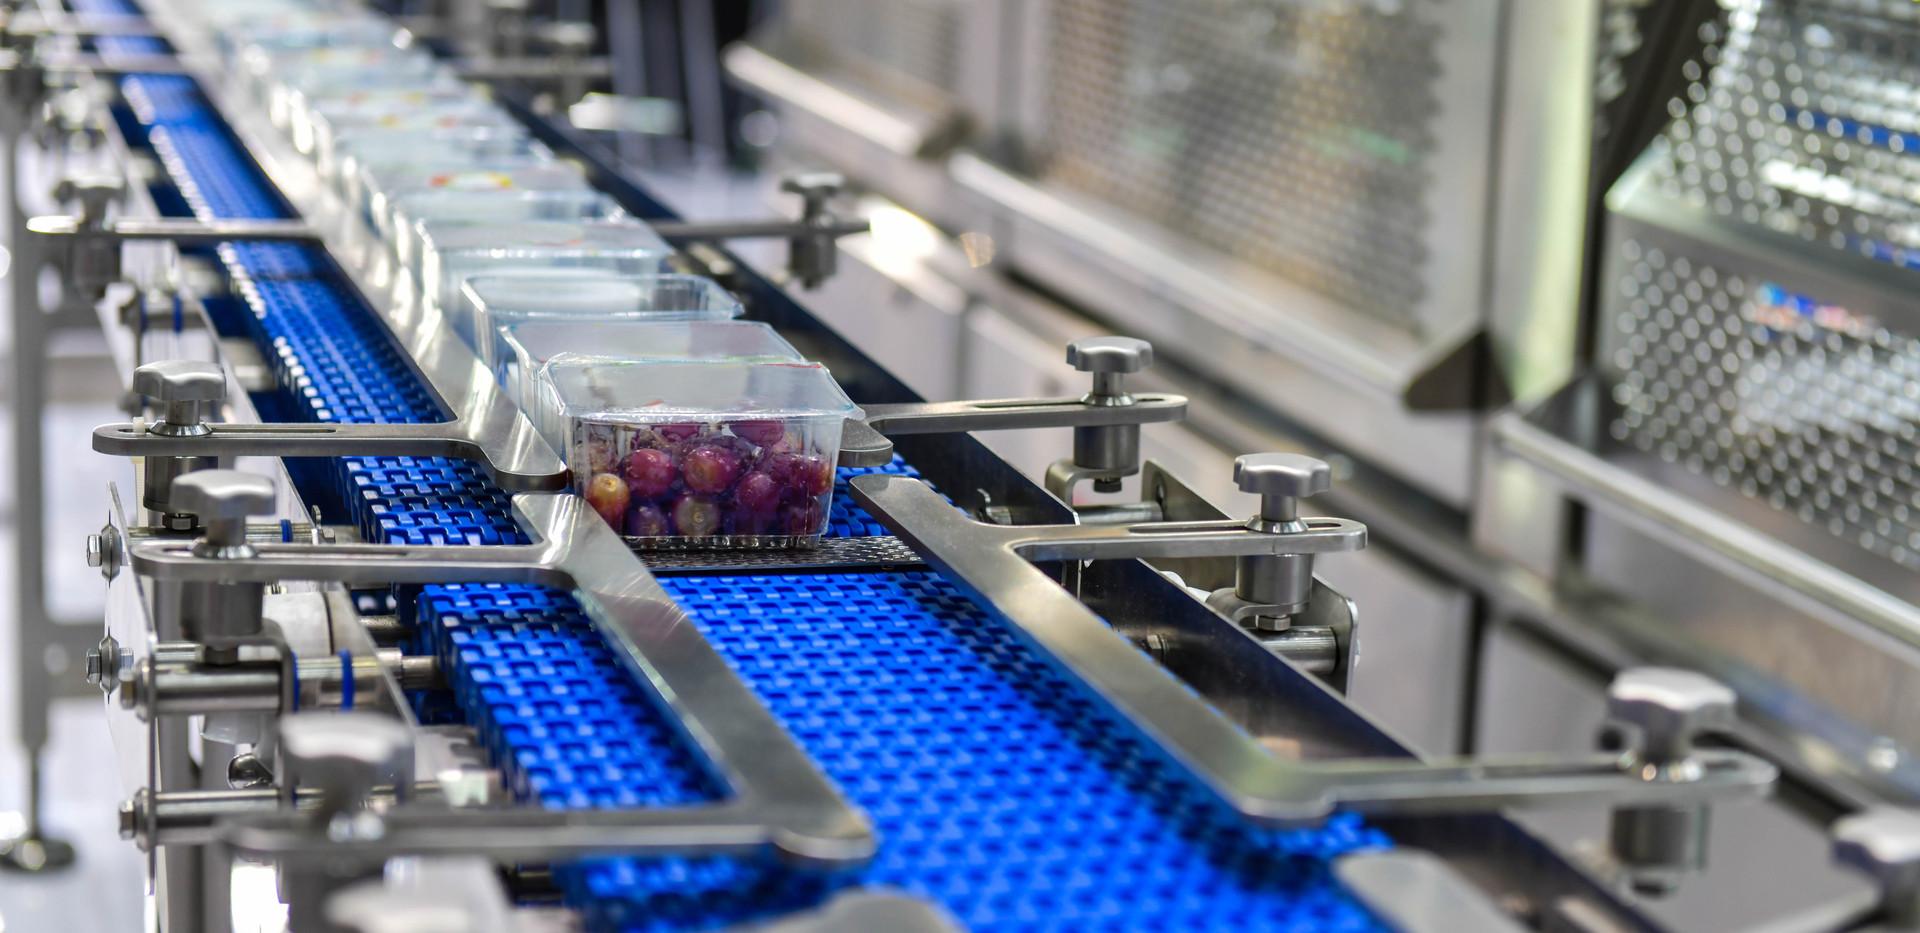 Modular Conveyor Belt - Food Indsutry